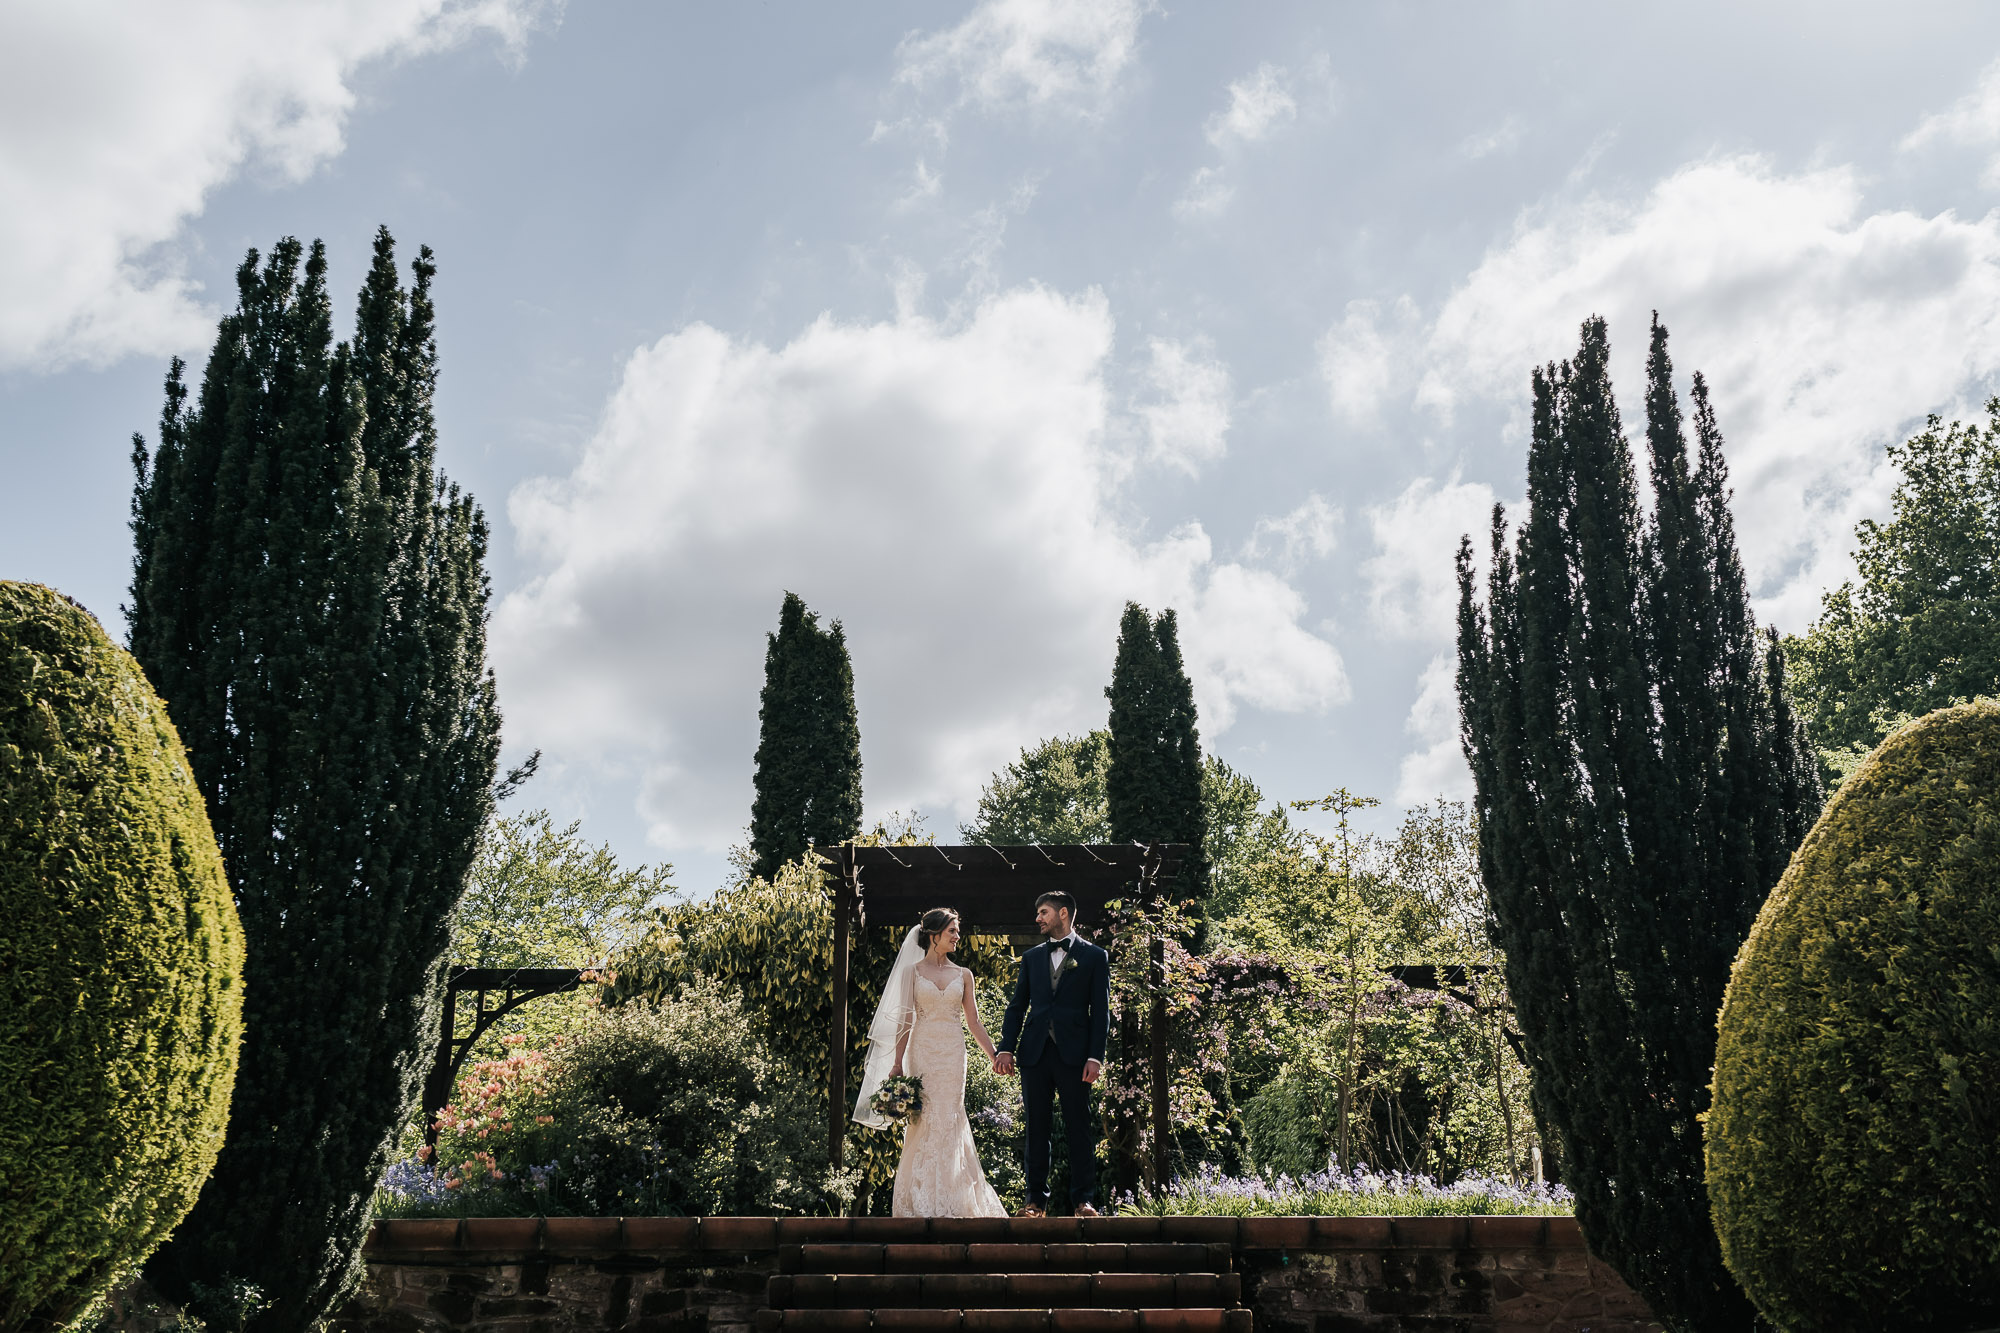 Nunsmere Hall Hotel Wedding photograhpy in cheshire wedding photographer (30 of 42).jpg